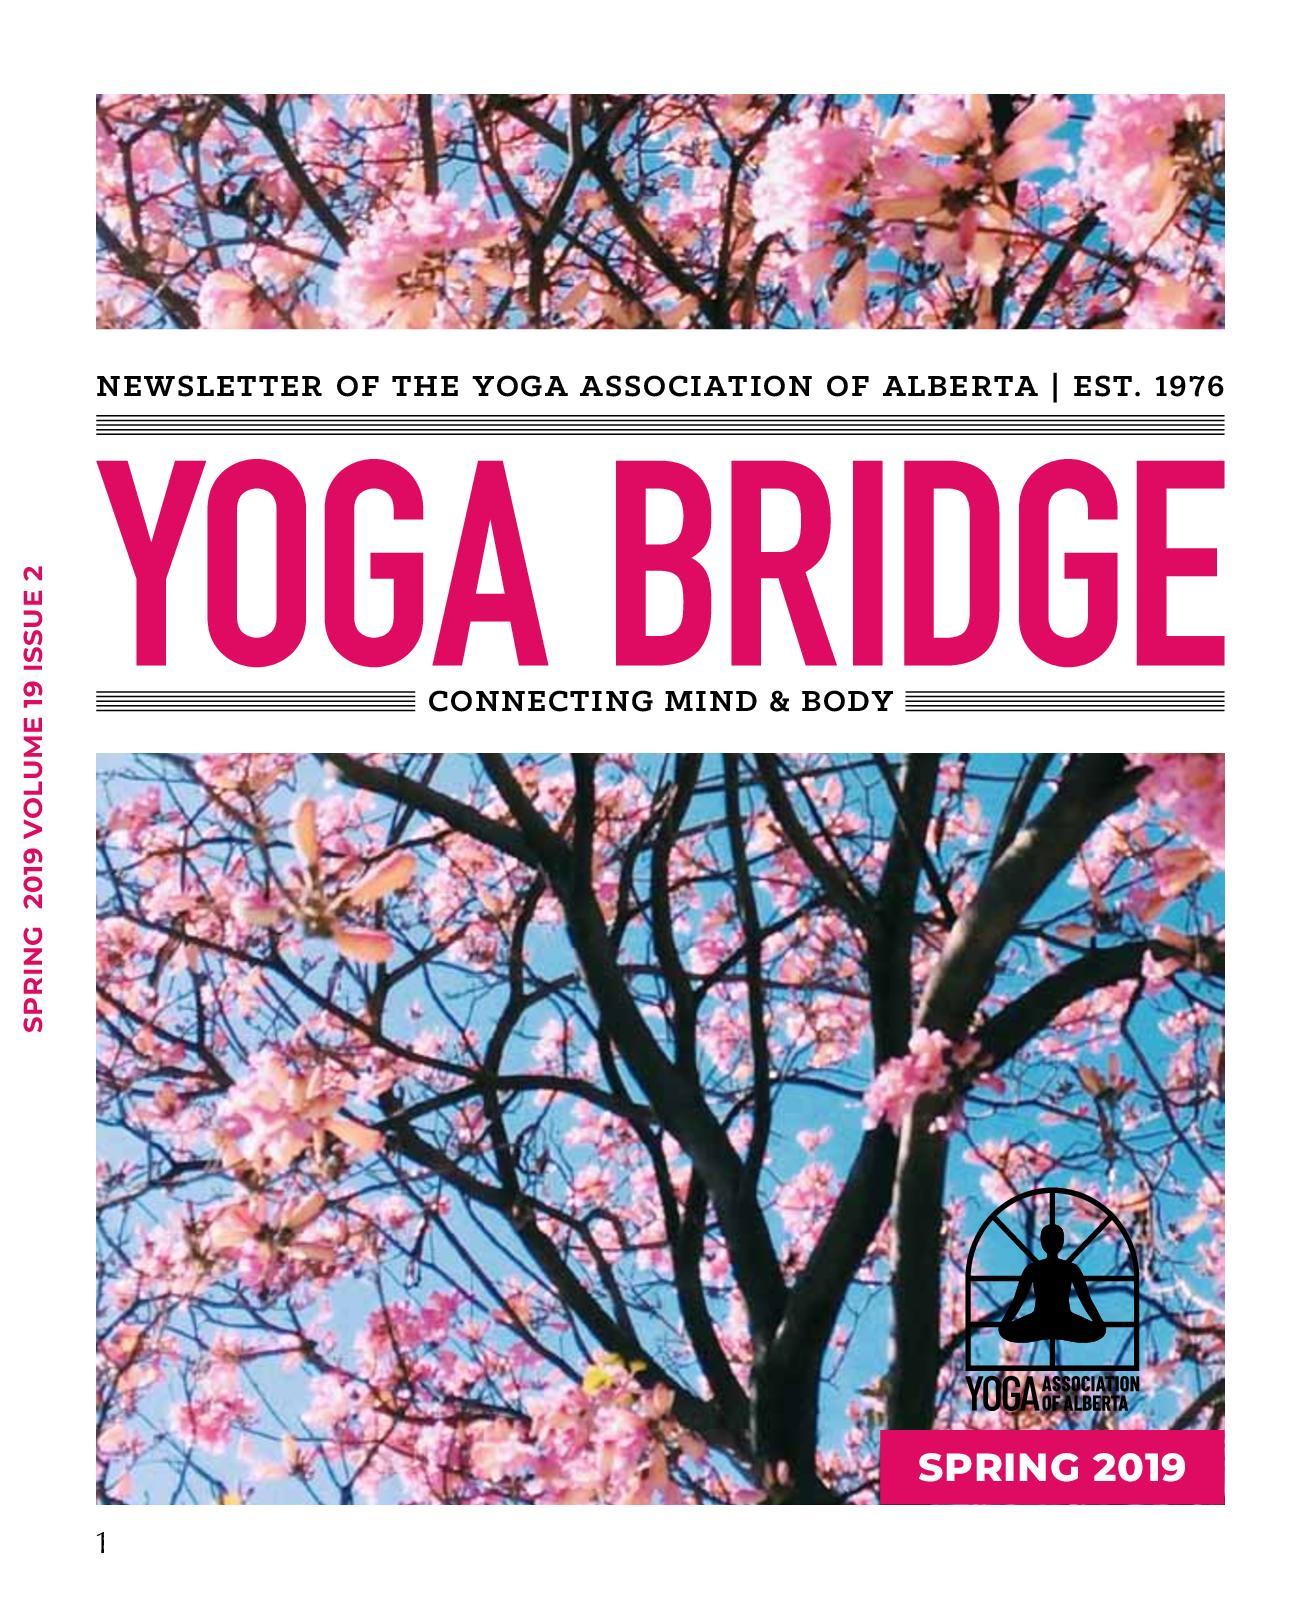 8108875e97 Calaméo - 2019 Spring Yoga Bridge Newsletter